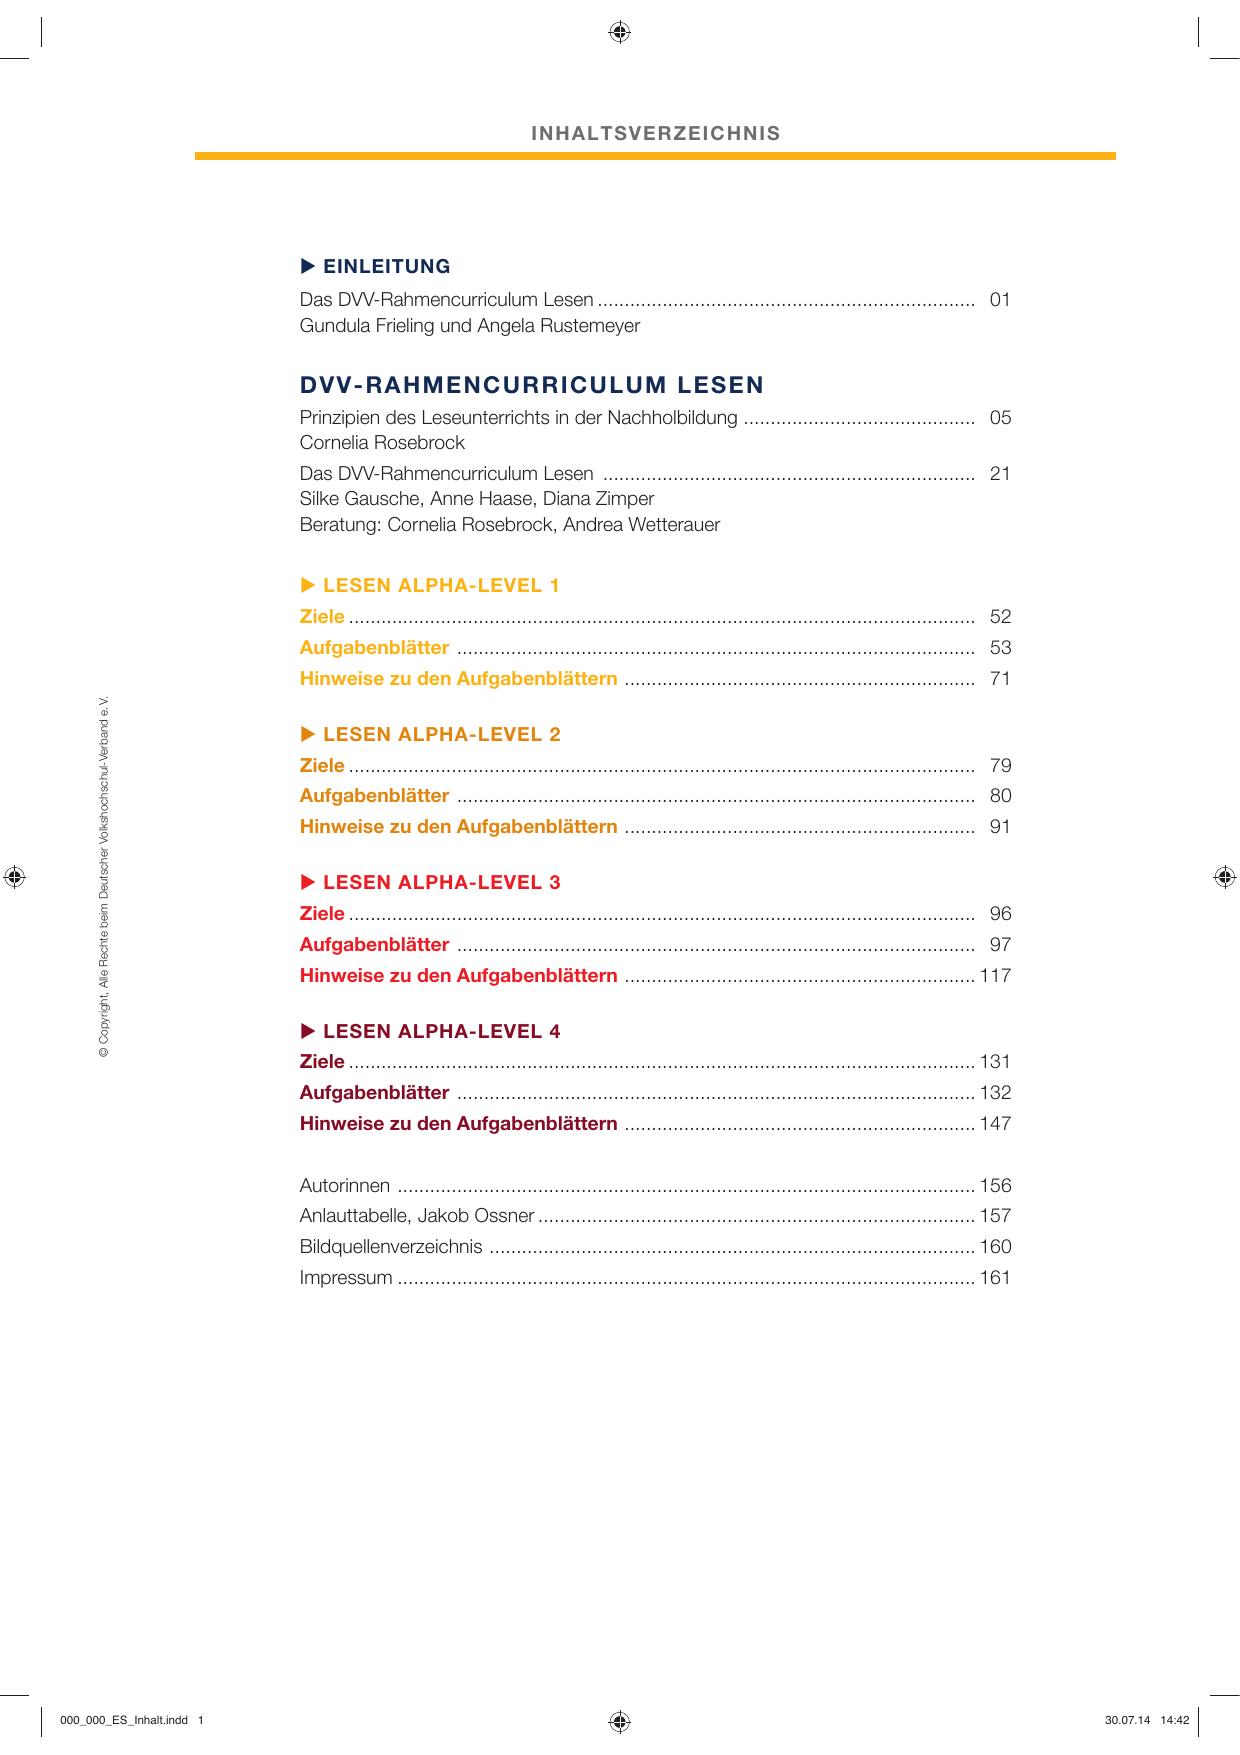 RC Lesen Komplett | manualzz.com